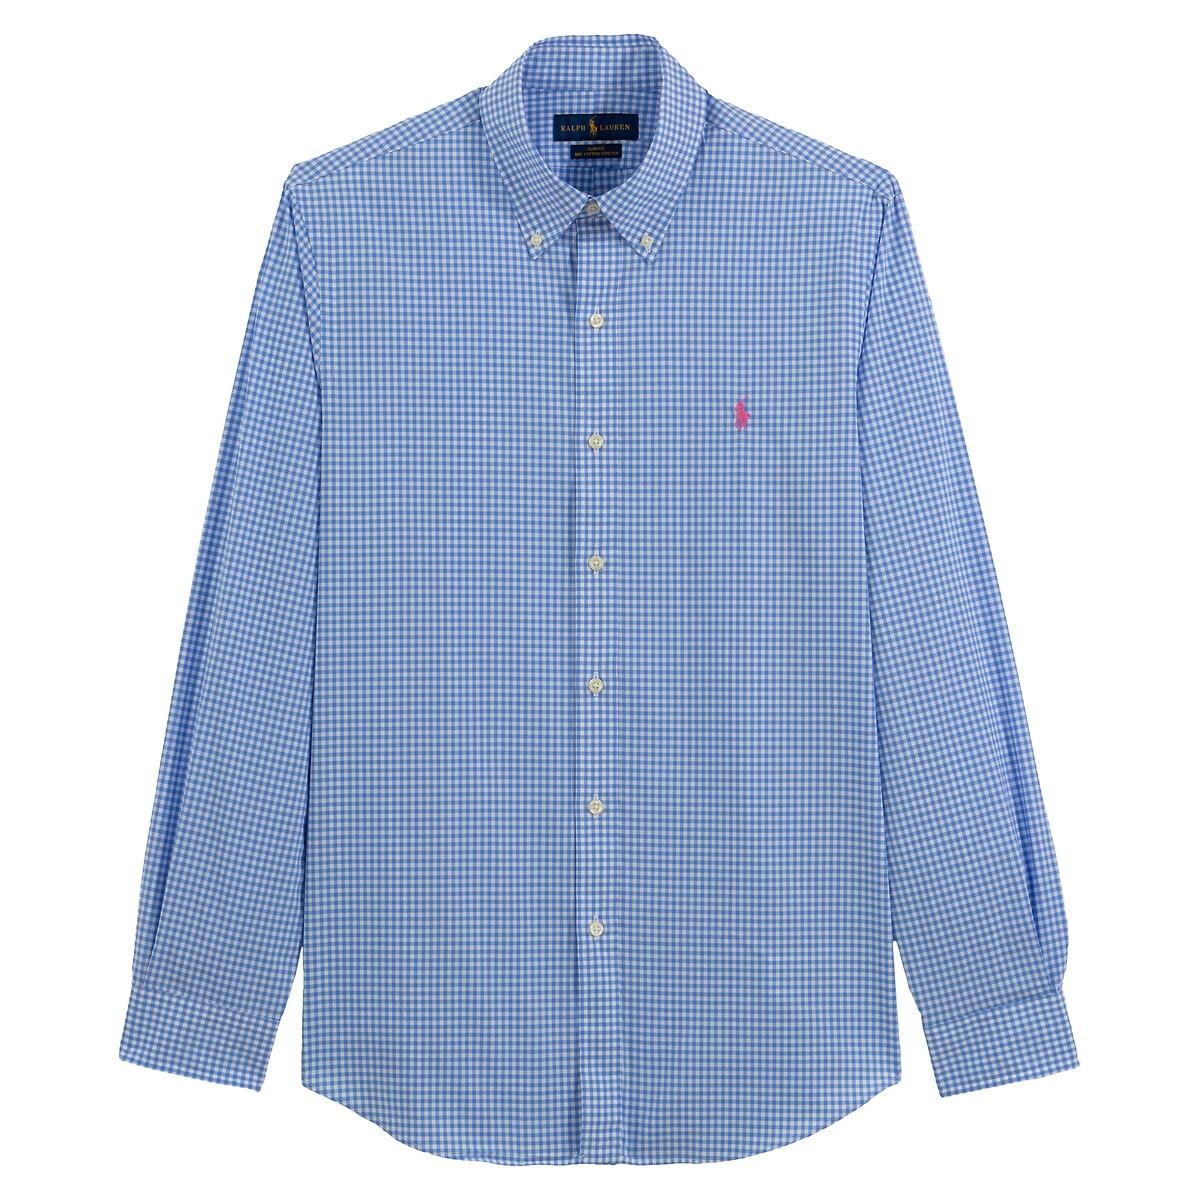 Рубашка La Redoute Узкого покроя в клетку из поплина S синий